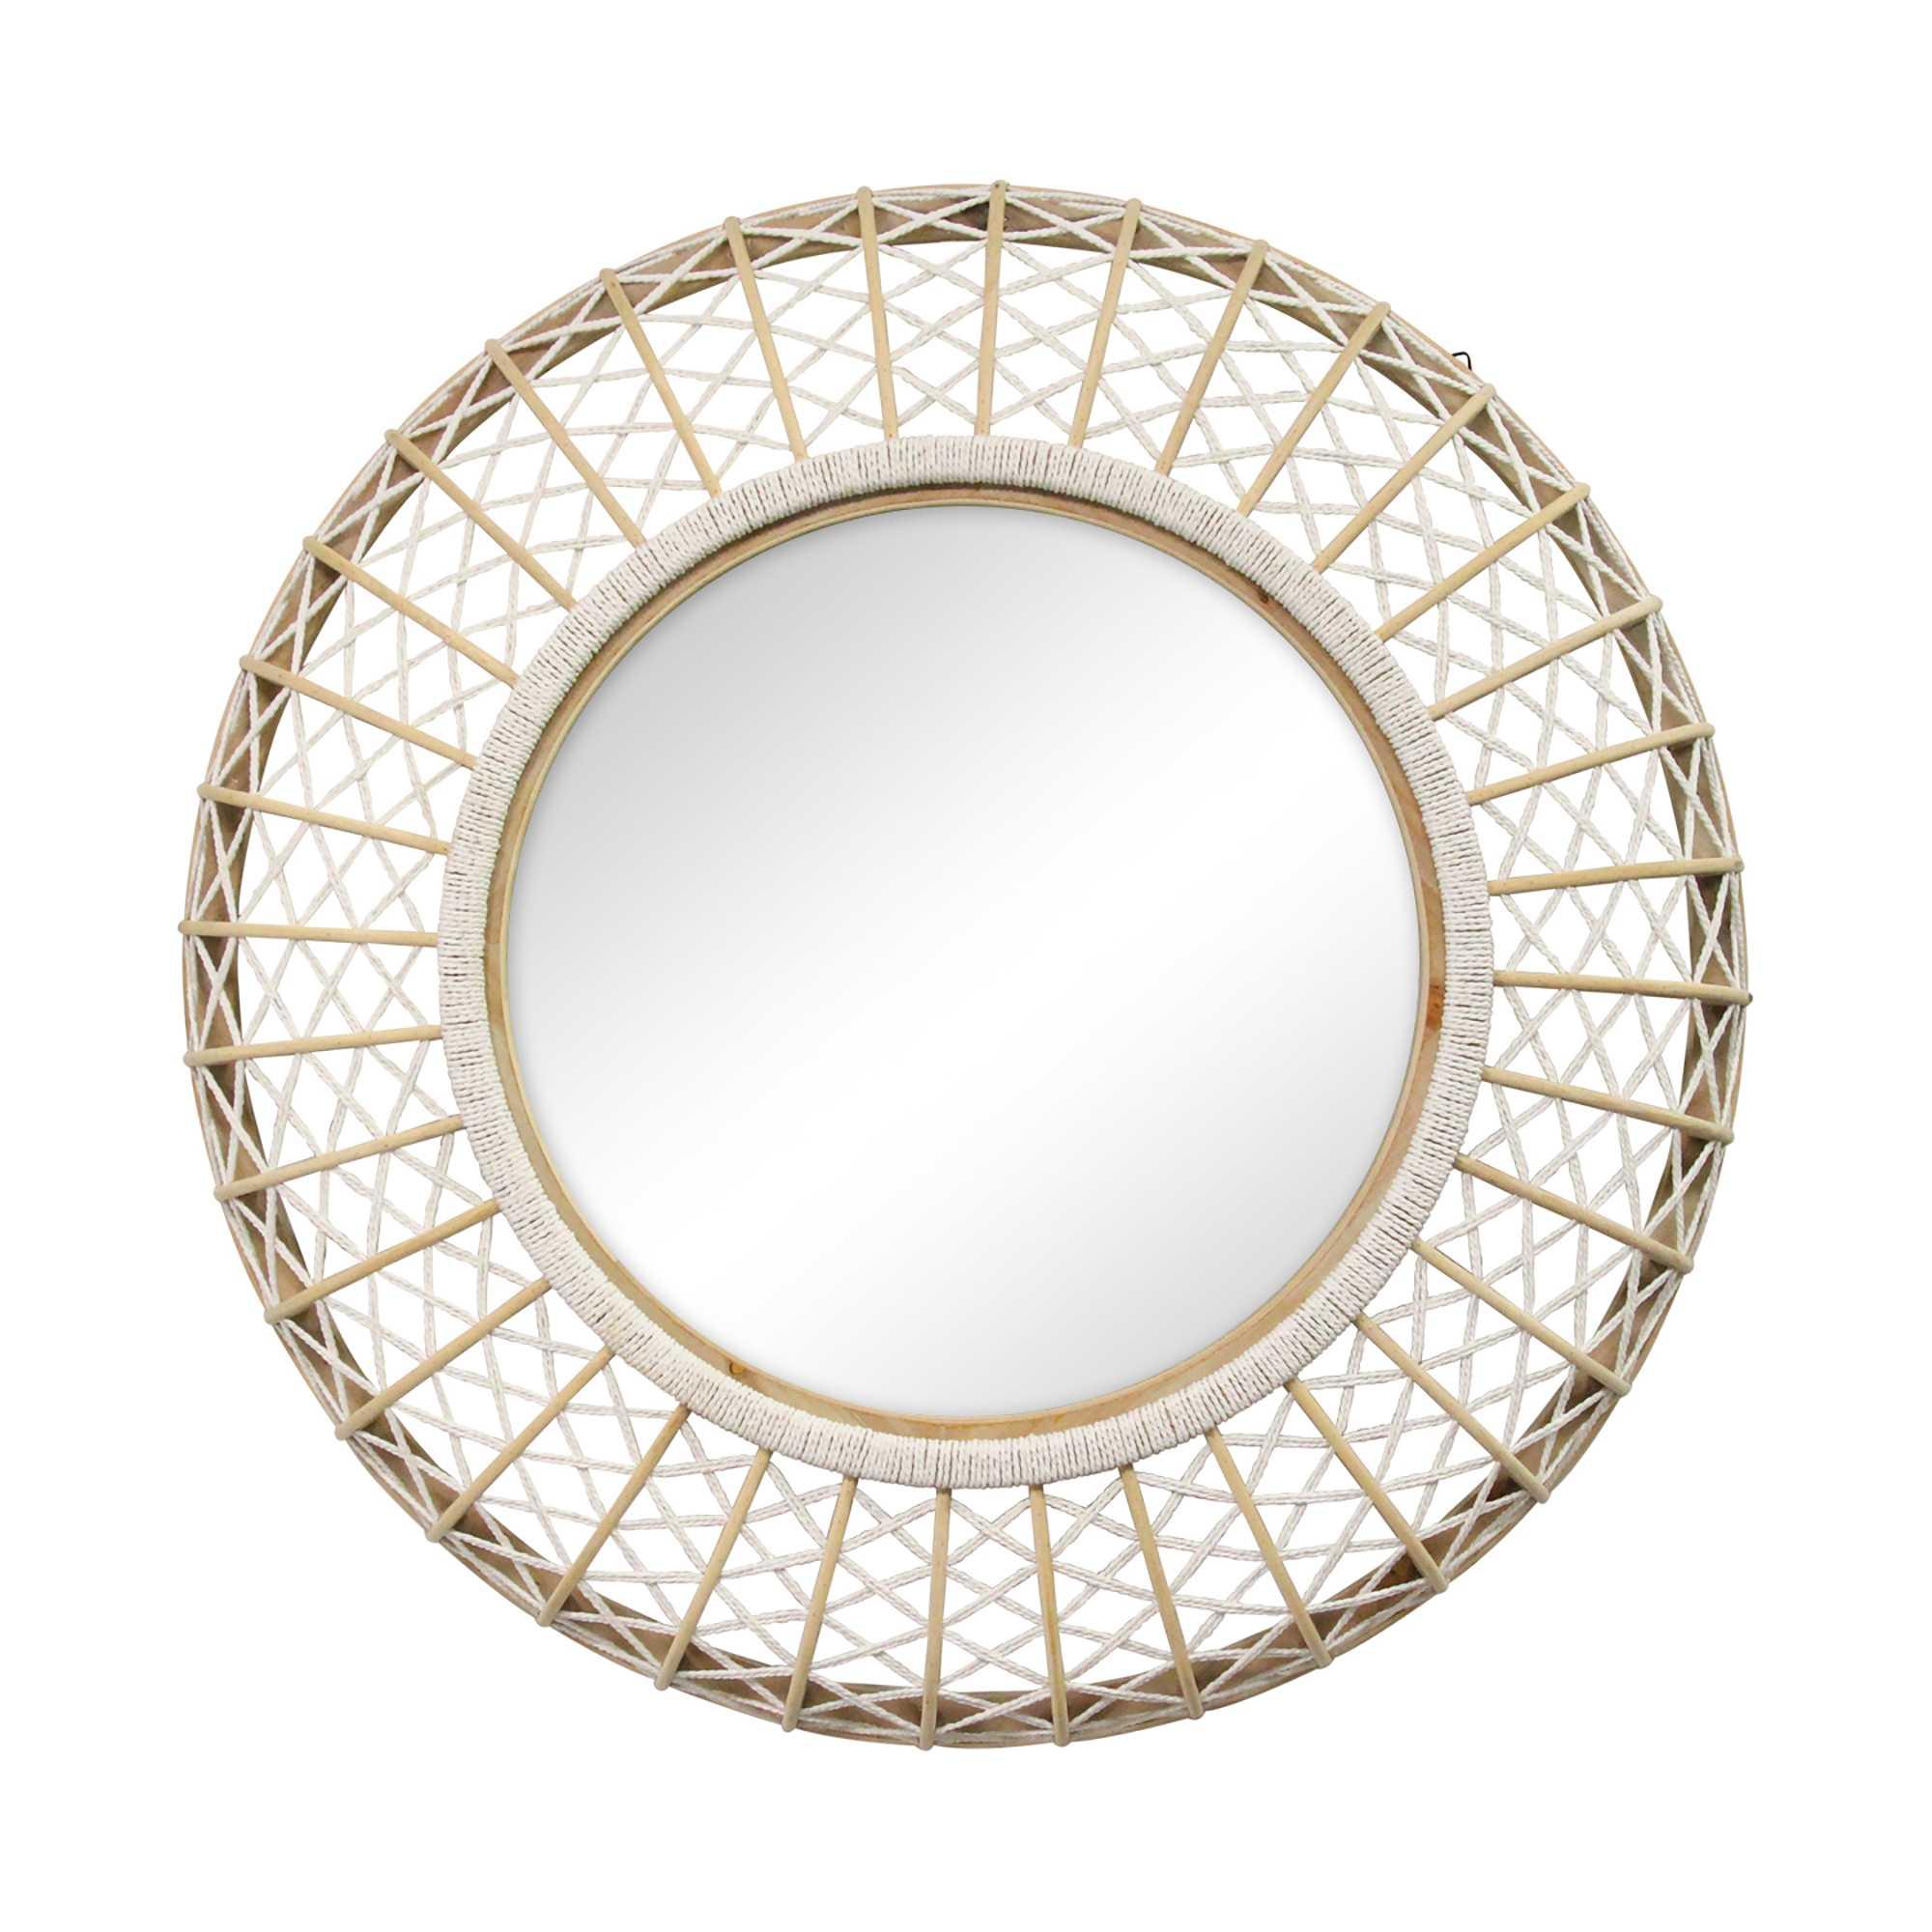 "33.50"" Woven Rattan Mirror"